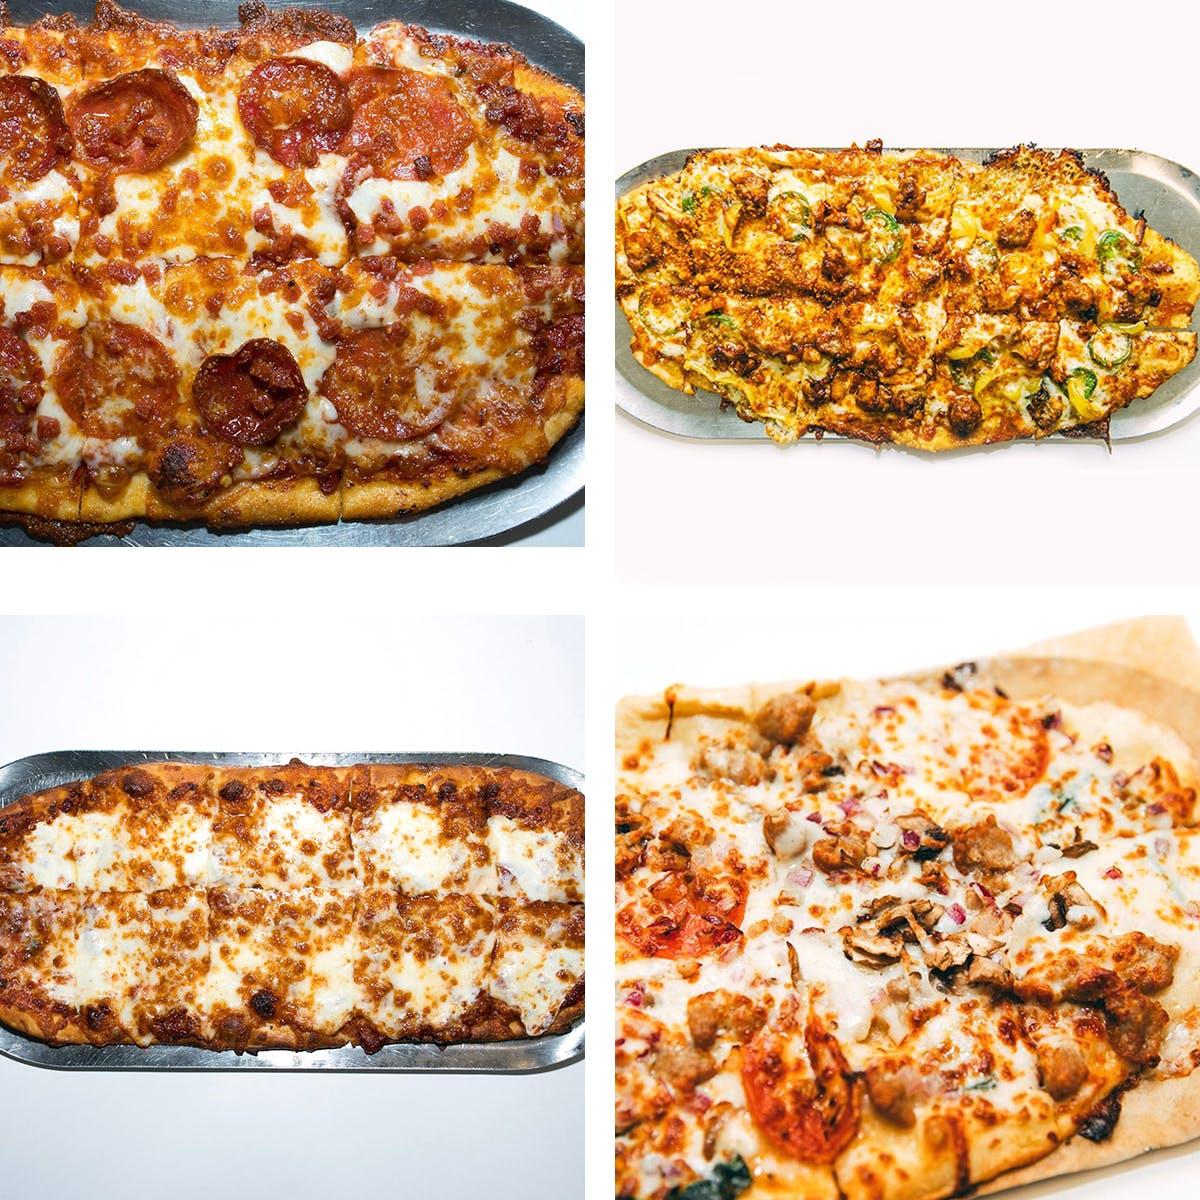 Slim & Husky's - Pizza Best Sellers - 4 Pack